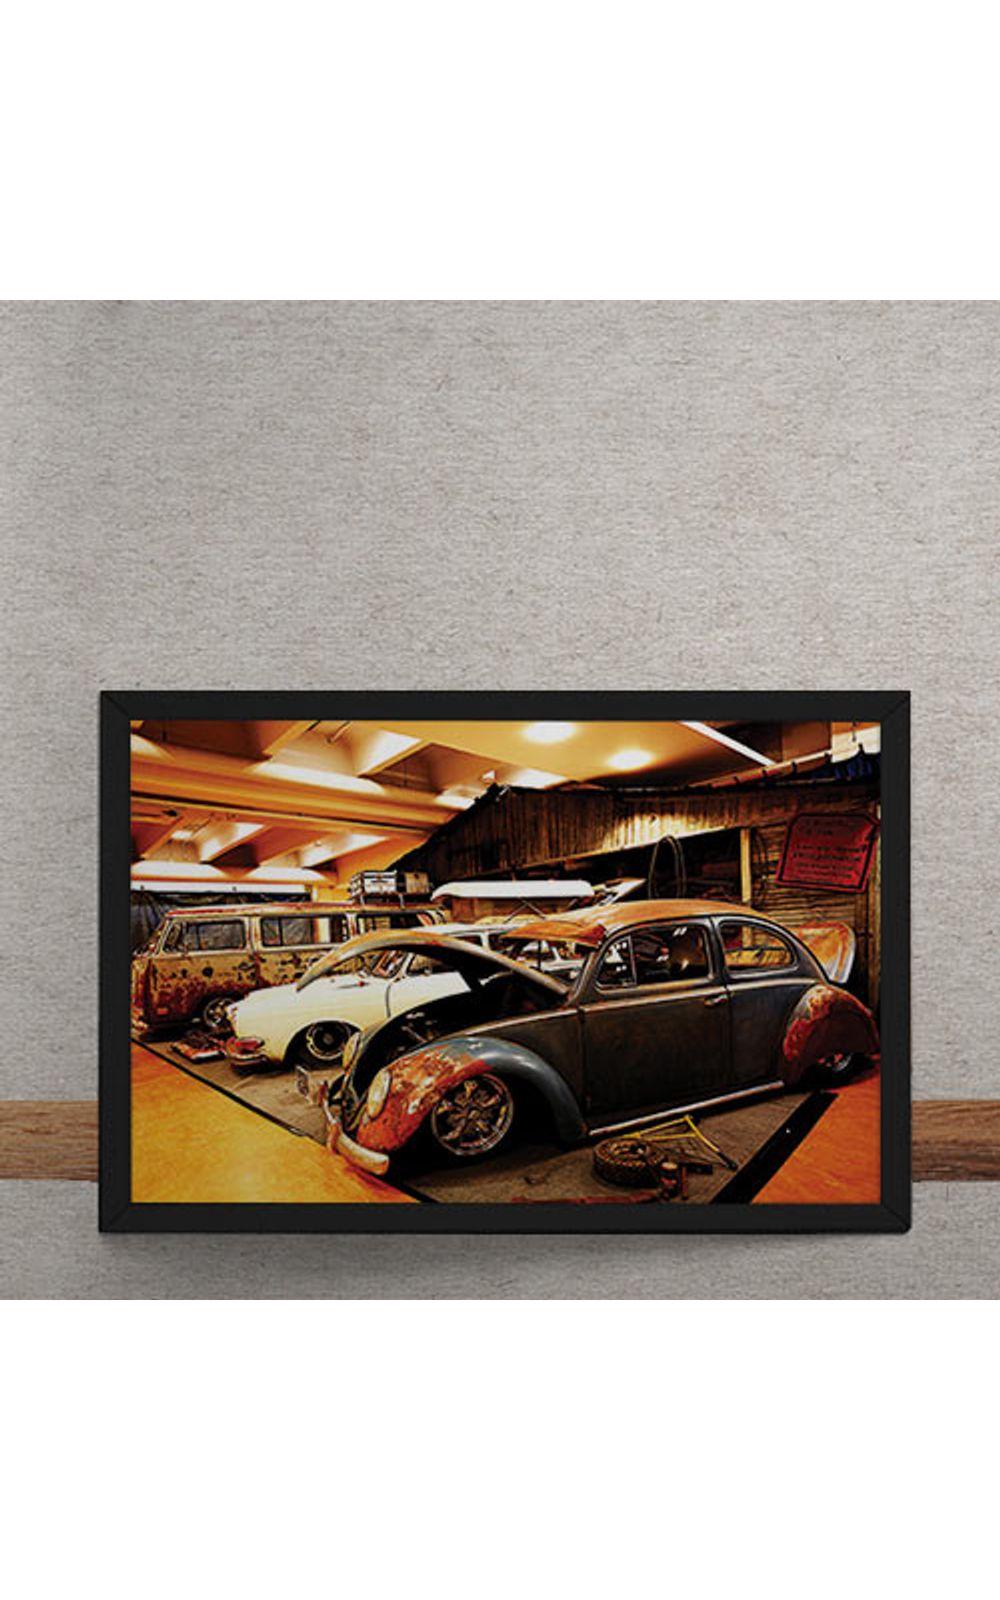 Foto 3 - Quadro Decorativo Carro Volkswagen Rat Look